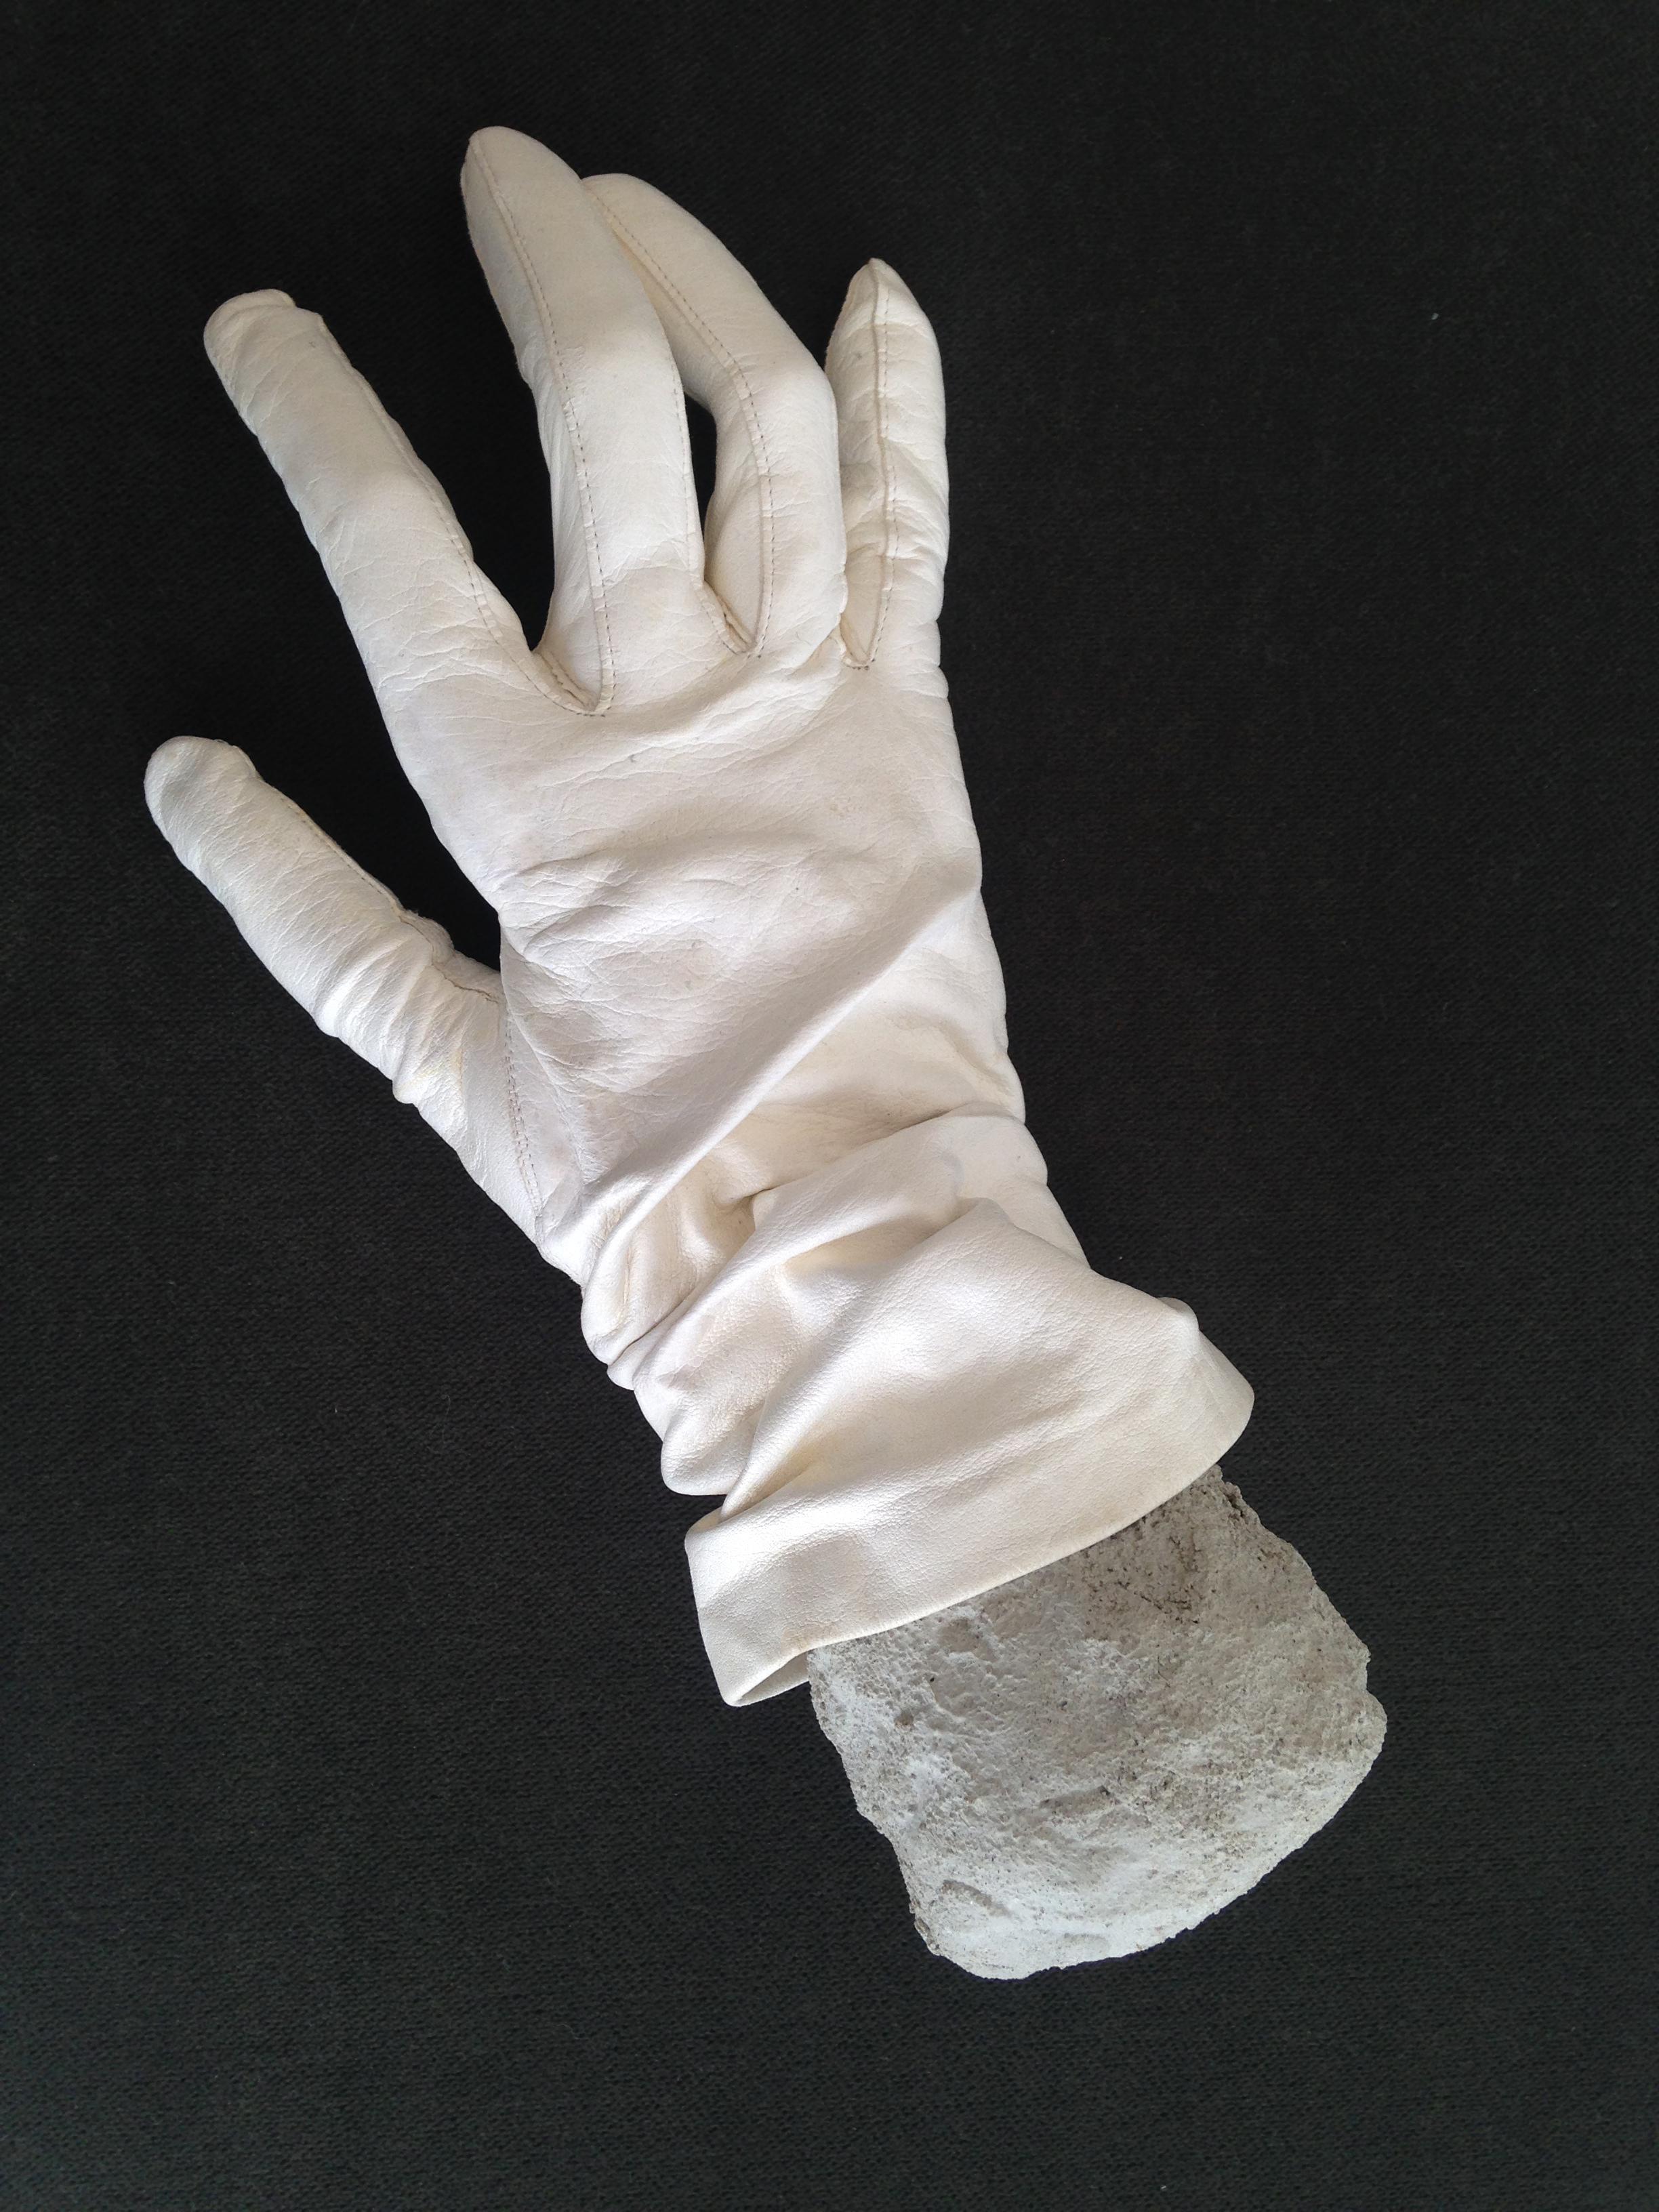 AM Dora Maar Man Ray, The Hand and the Glove.jpg